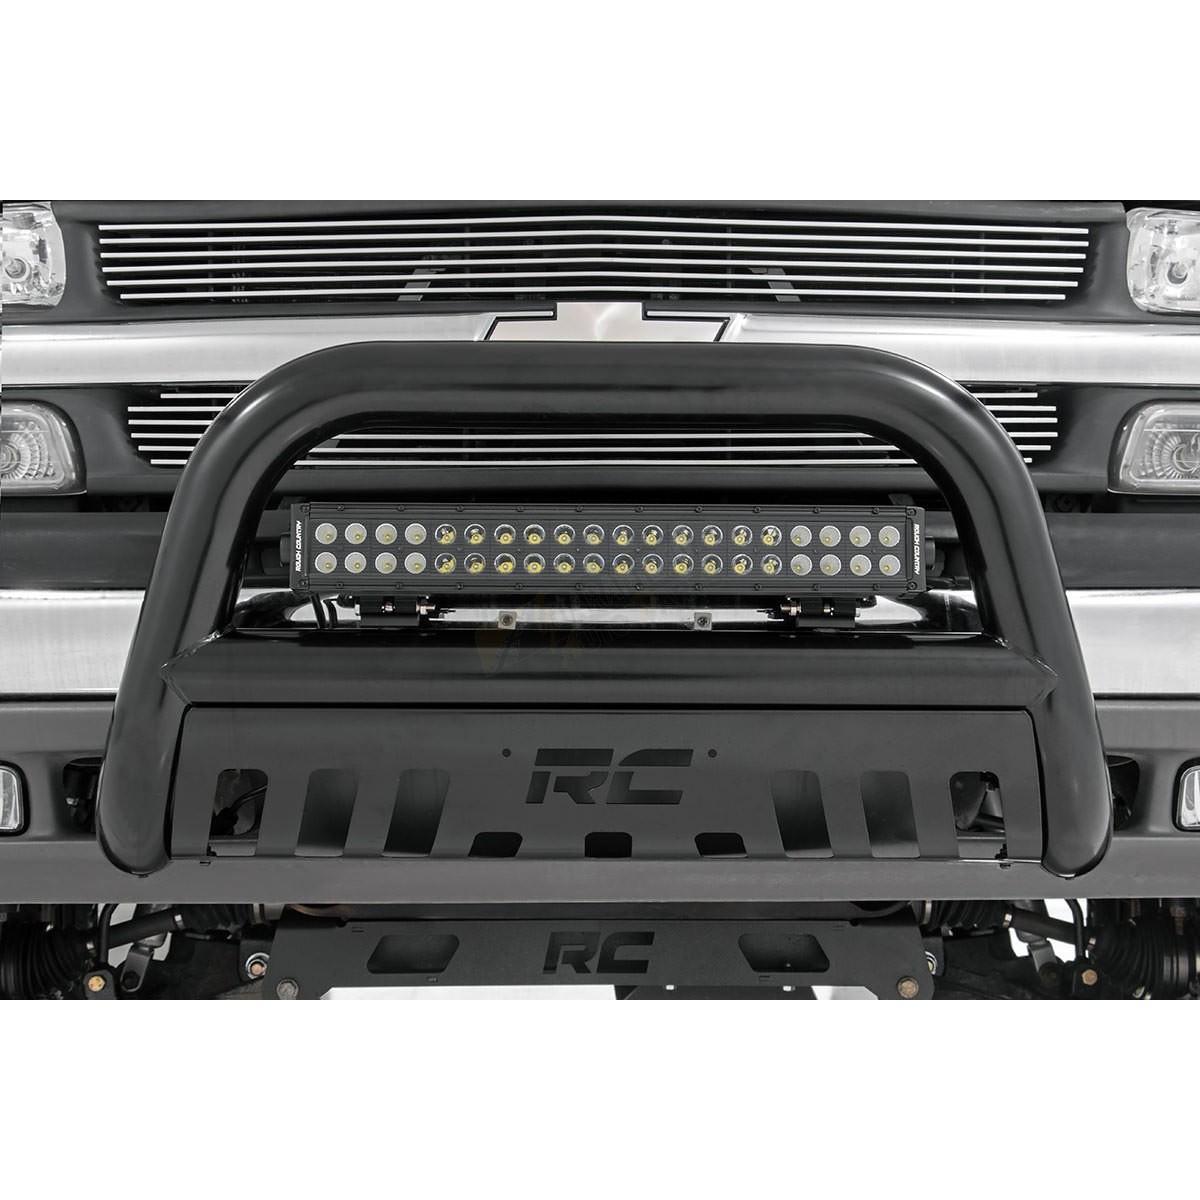 rough country 20 inch cree led light bar dual row black series